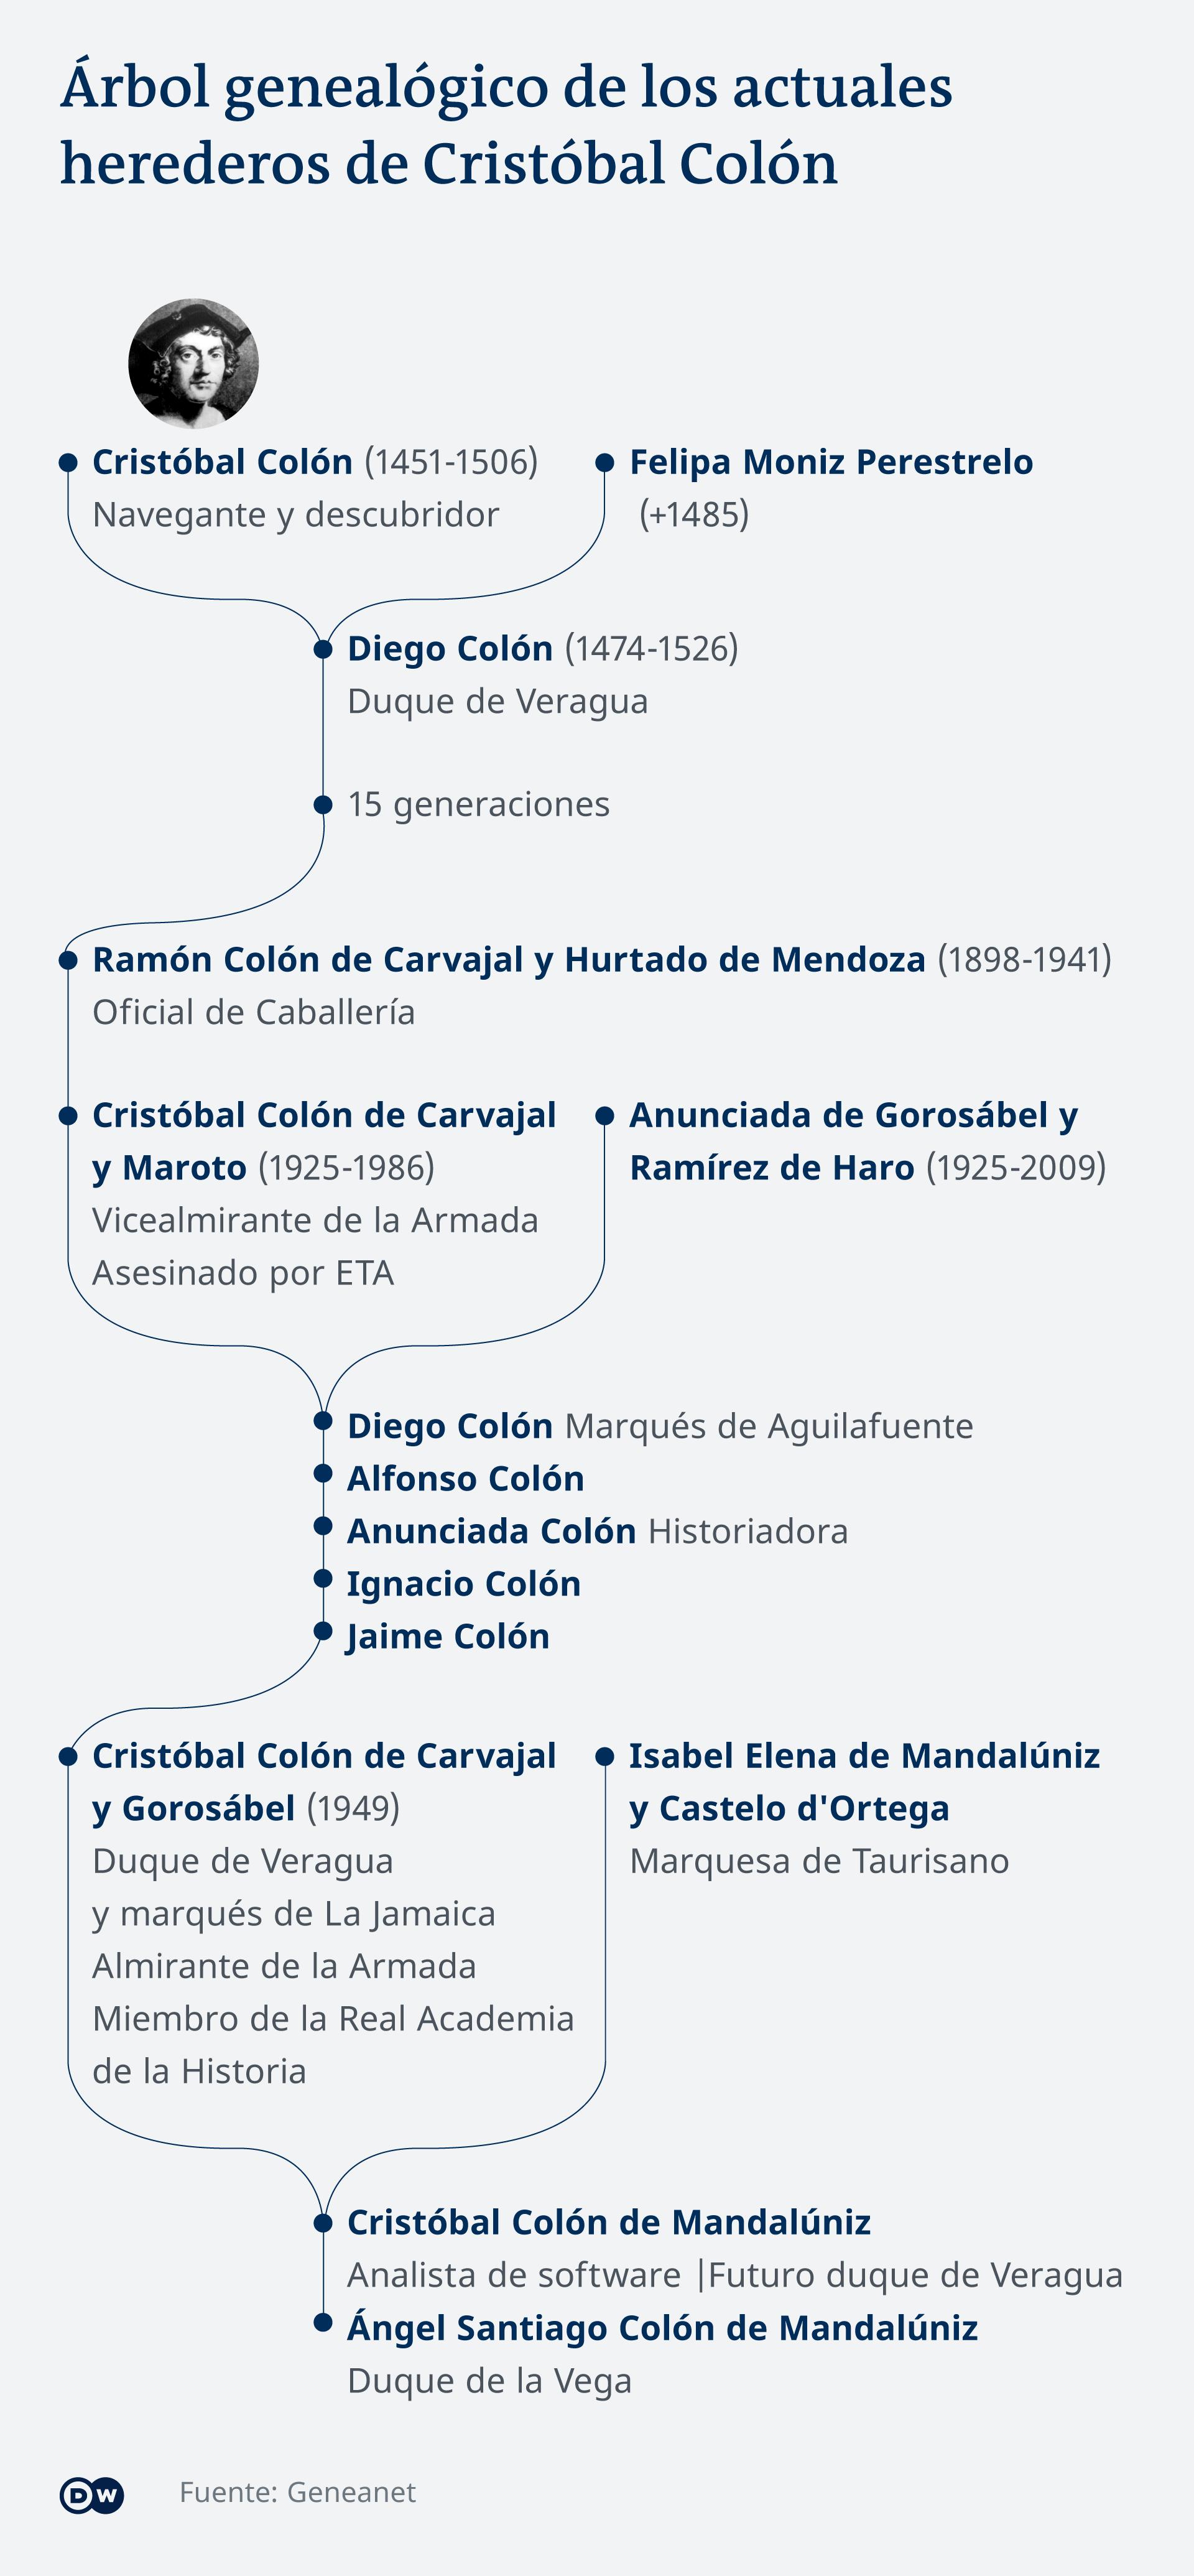 Infografik Stammbaum Cristobal Colon ES